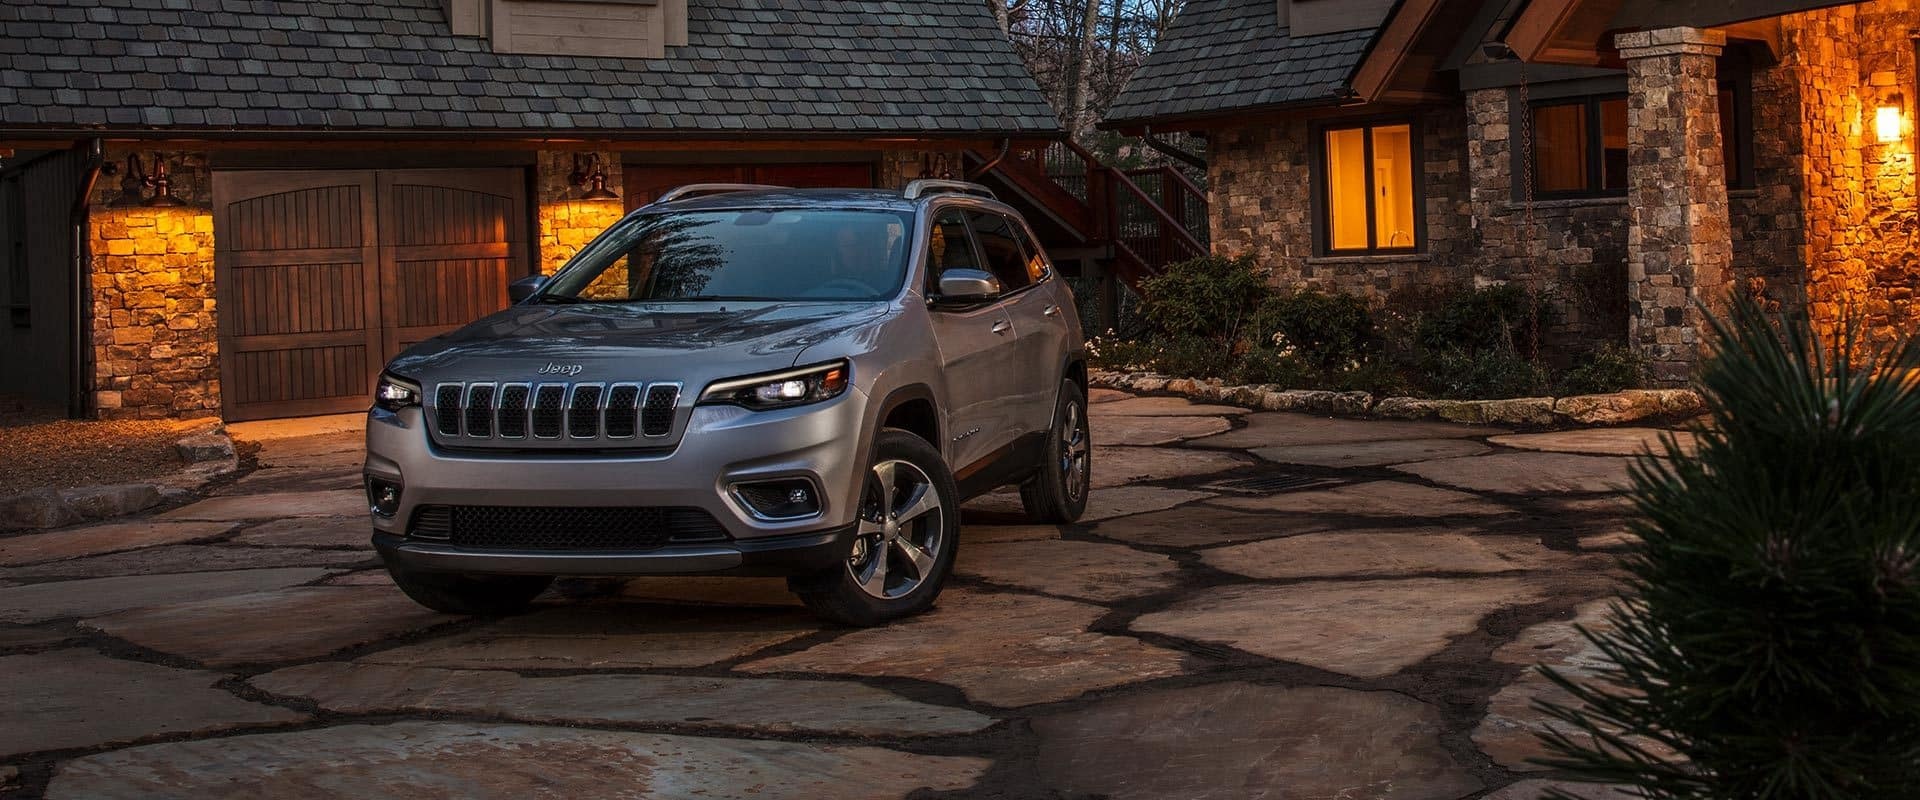 2019 Jeep Cherokee Exterior Wheels Amp Design